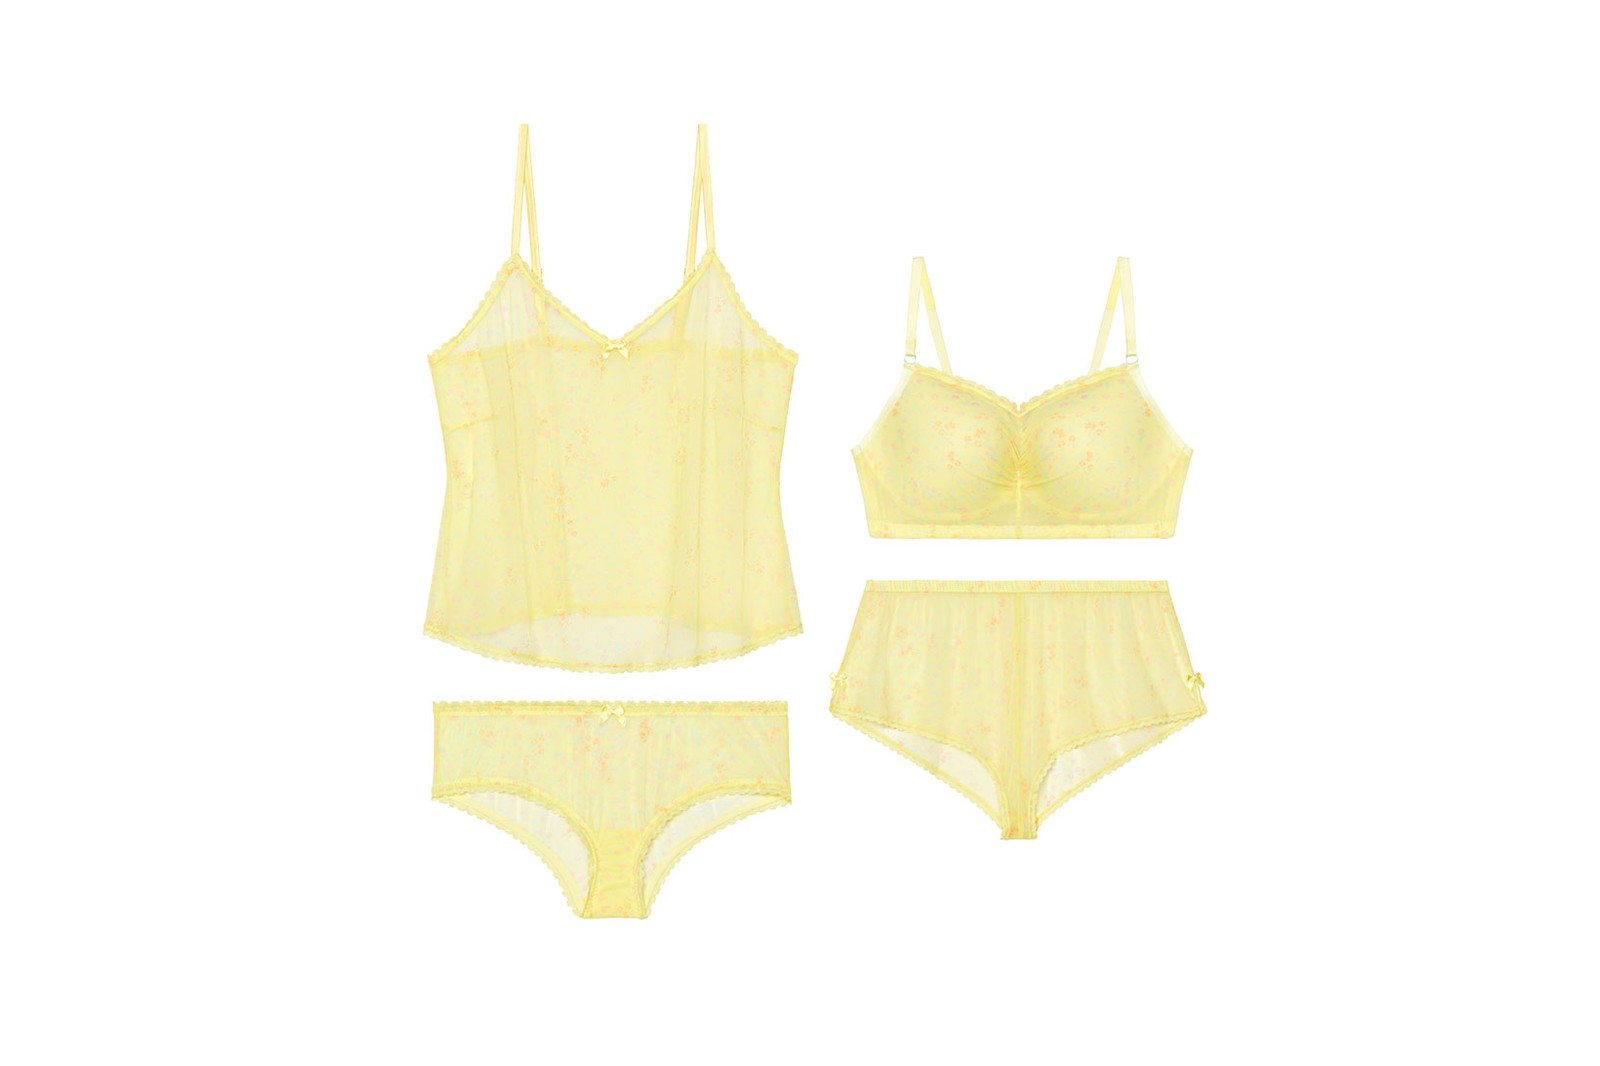 Rihanna Savage X Fenty April 2019 Underwear Bras